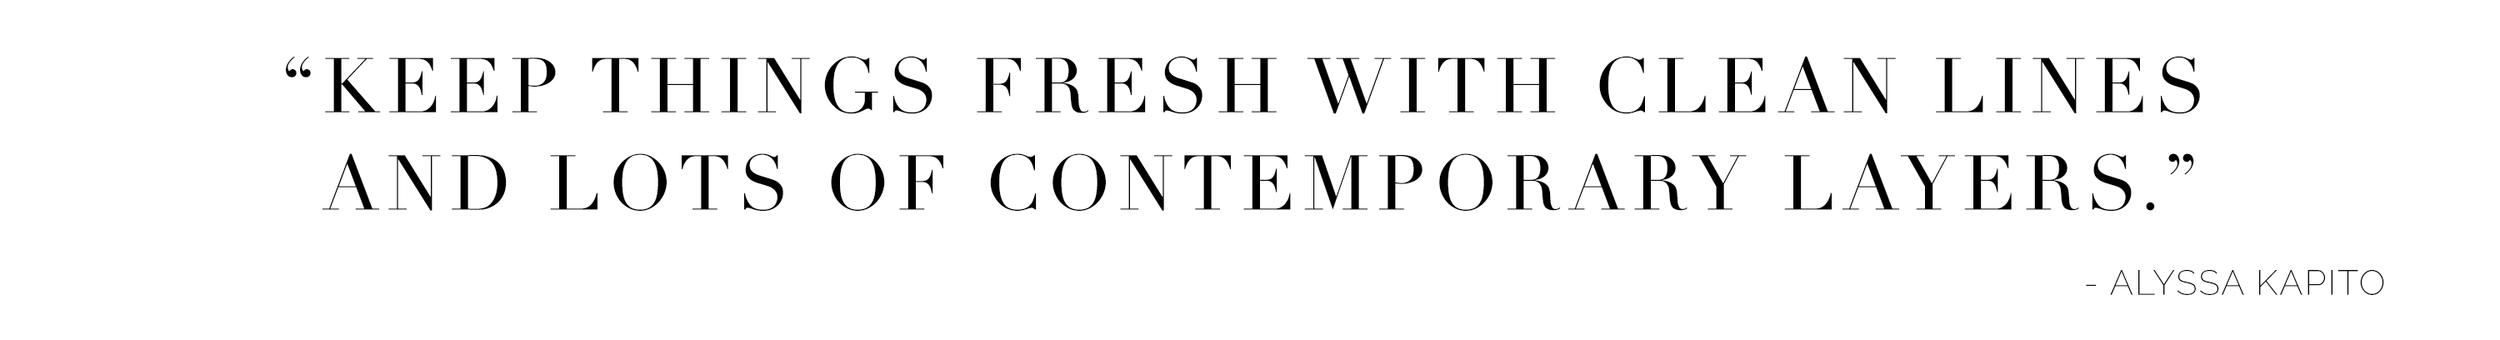 Alyssa Rosenheck's The New Southern Designer Spotlight with Alyssa Kapito, Alyssa Kapito Interiors of New York, NY